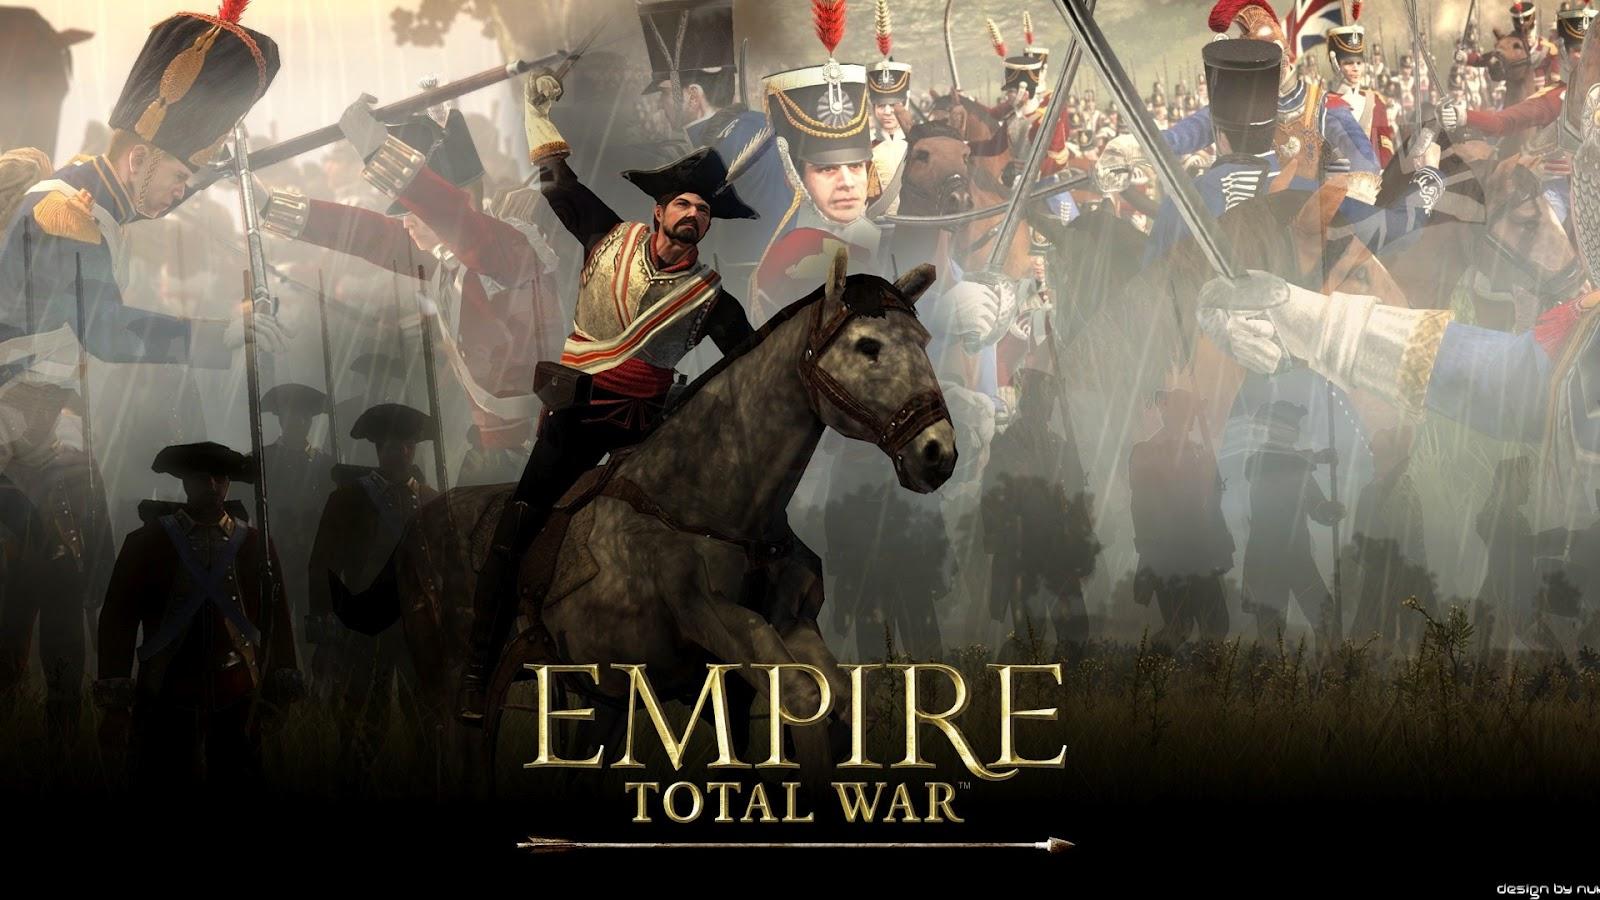 Empire Total war Wallpaper 1 1920x1080 1600x900